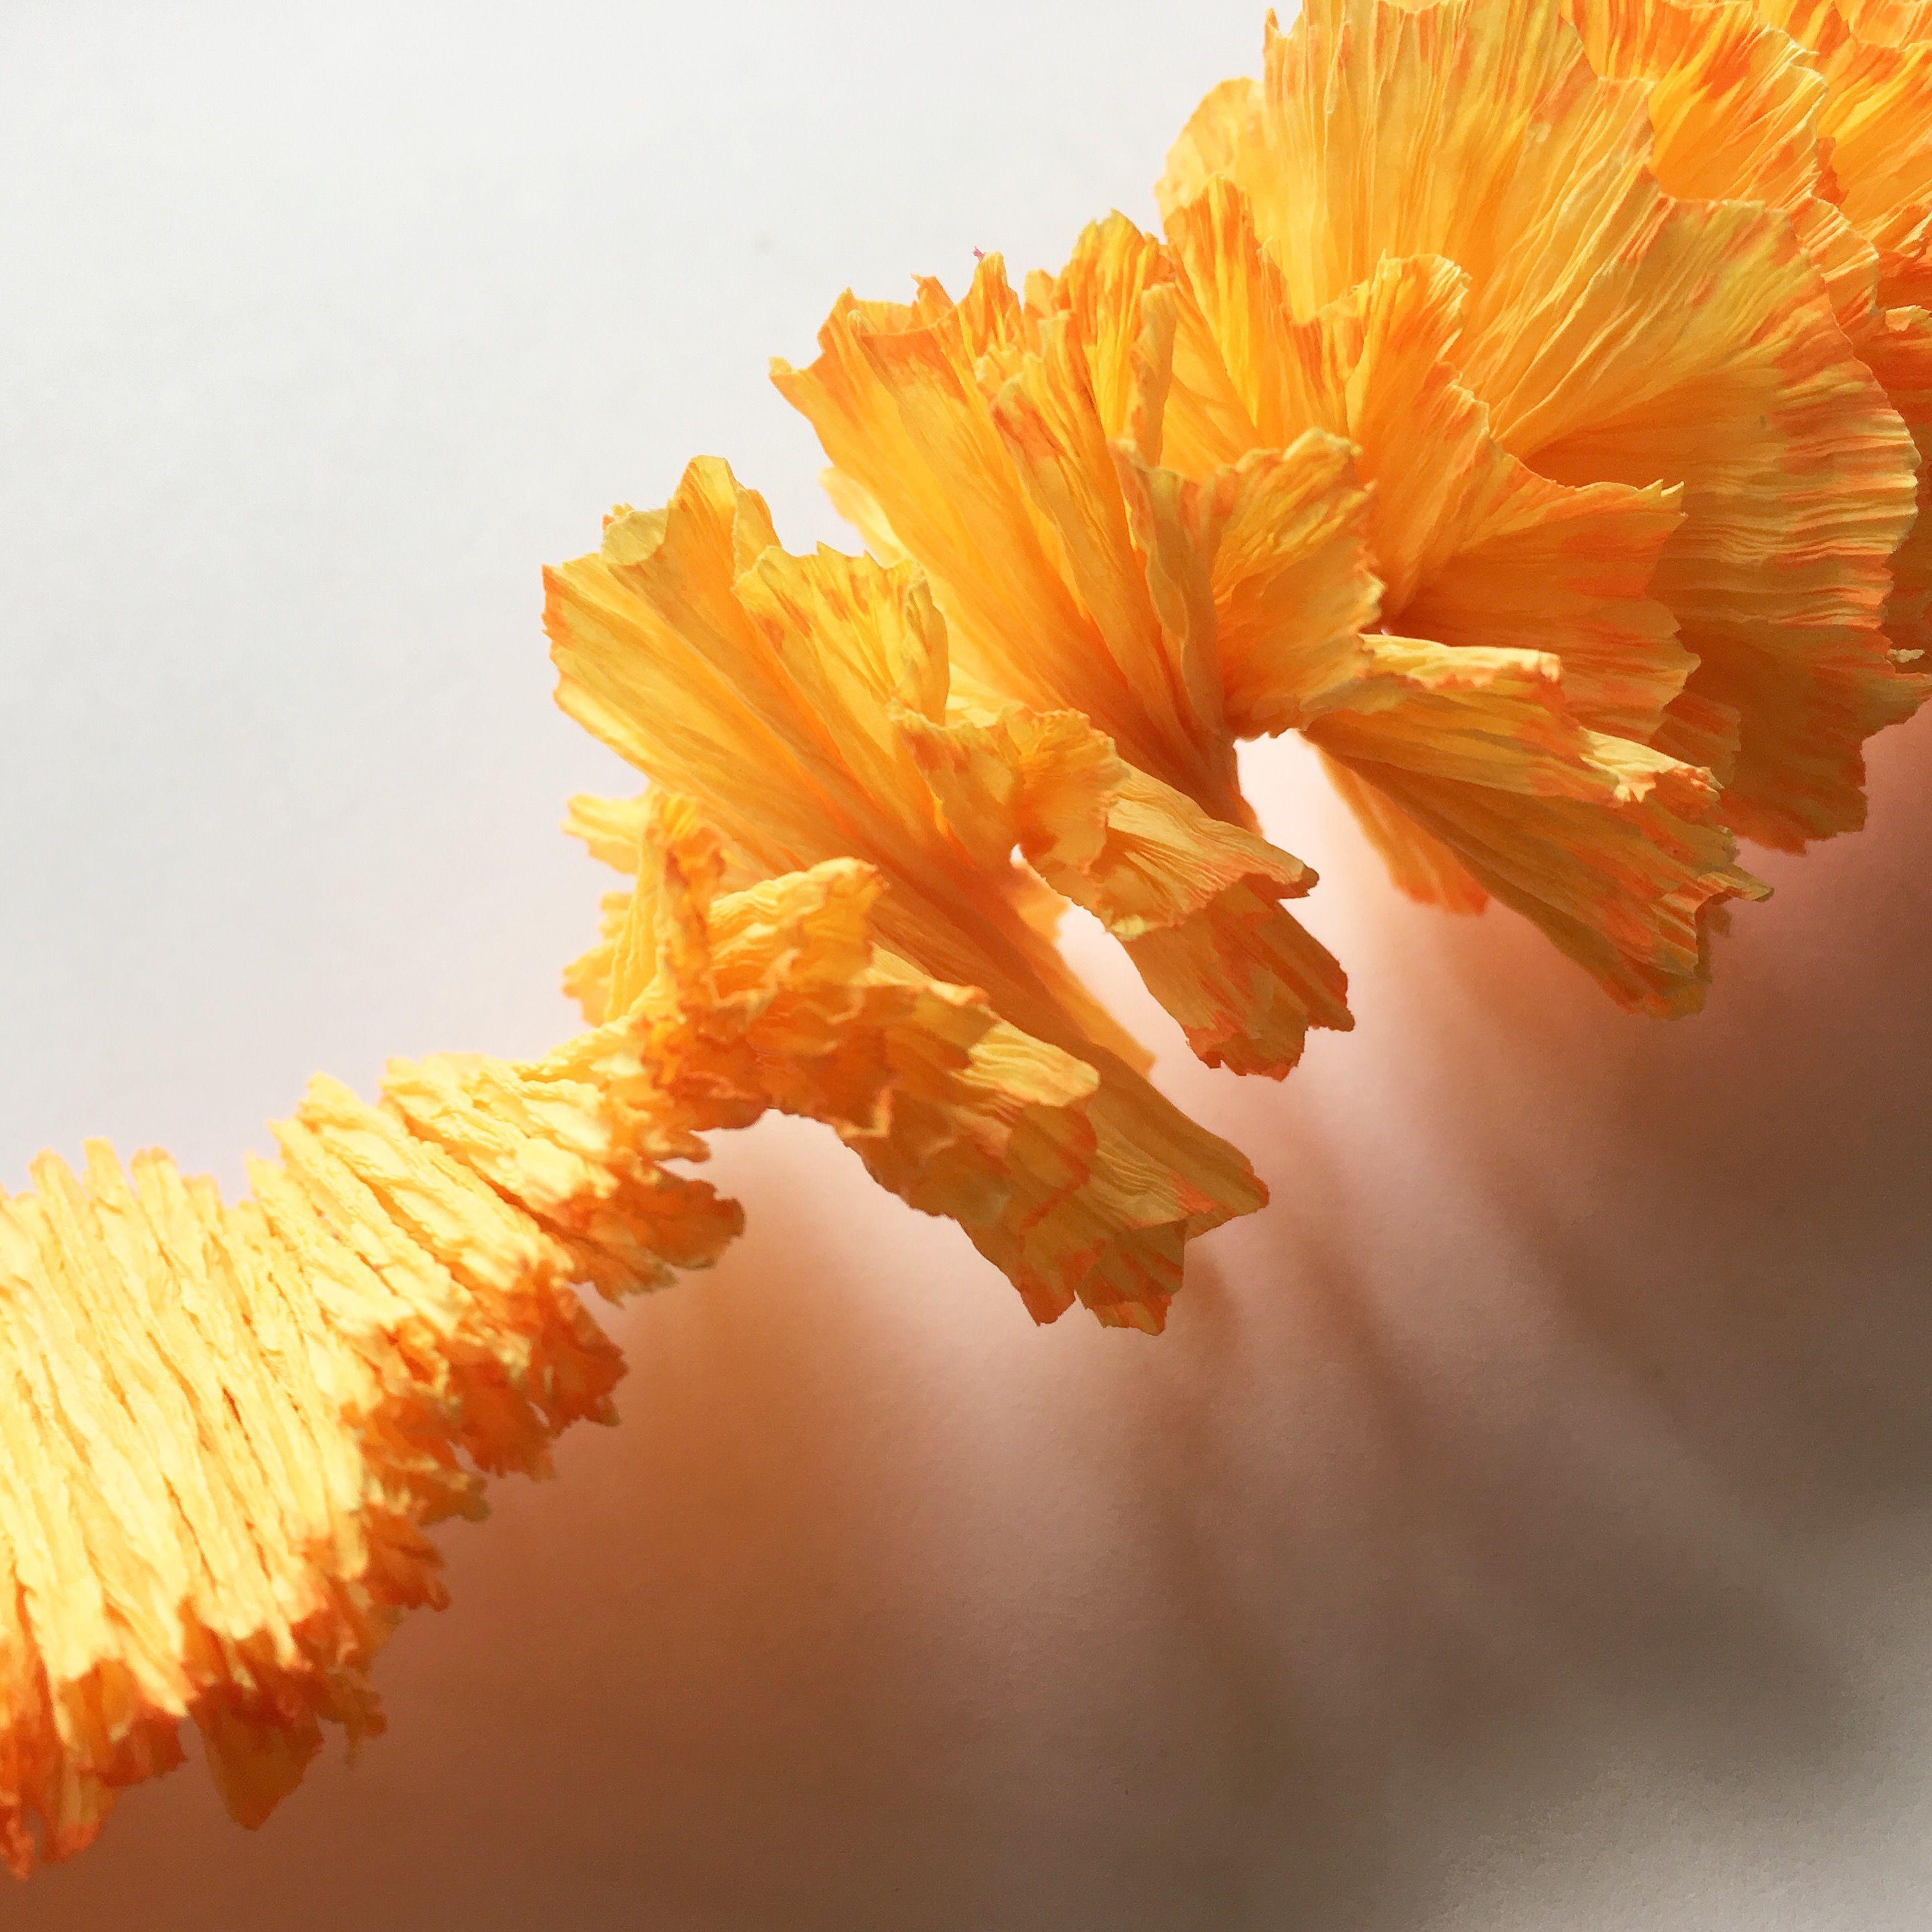 How To Make Marigold Paper Flower Marigold Crepe Paper Art Paper